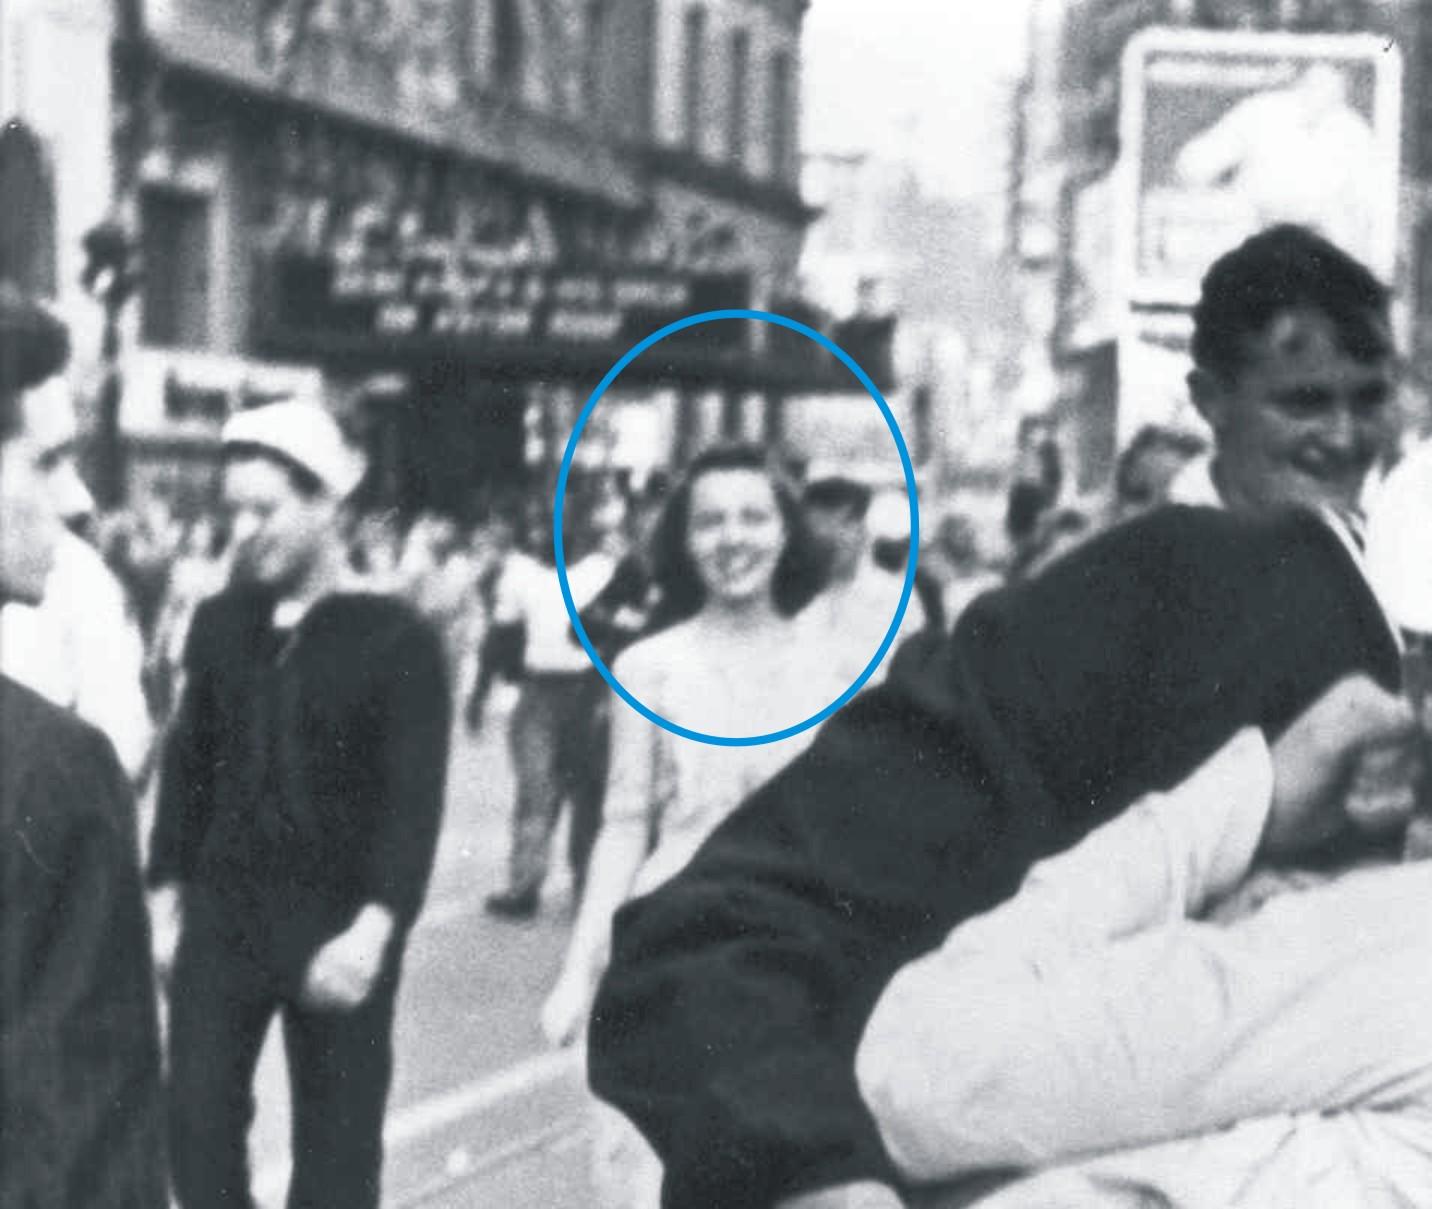 VJday Times Square Kiss